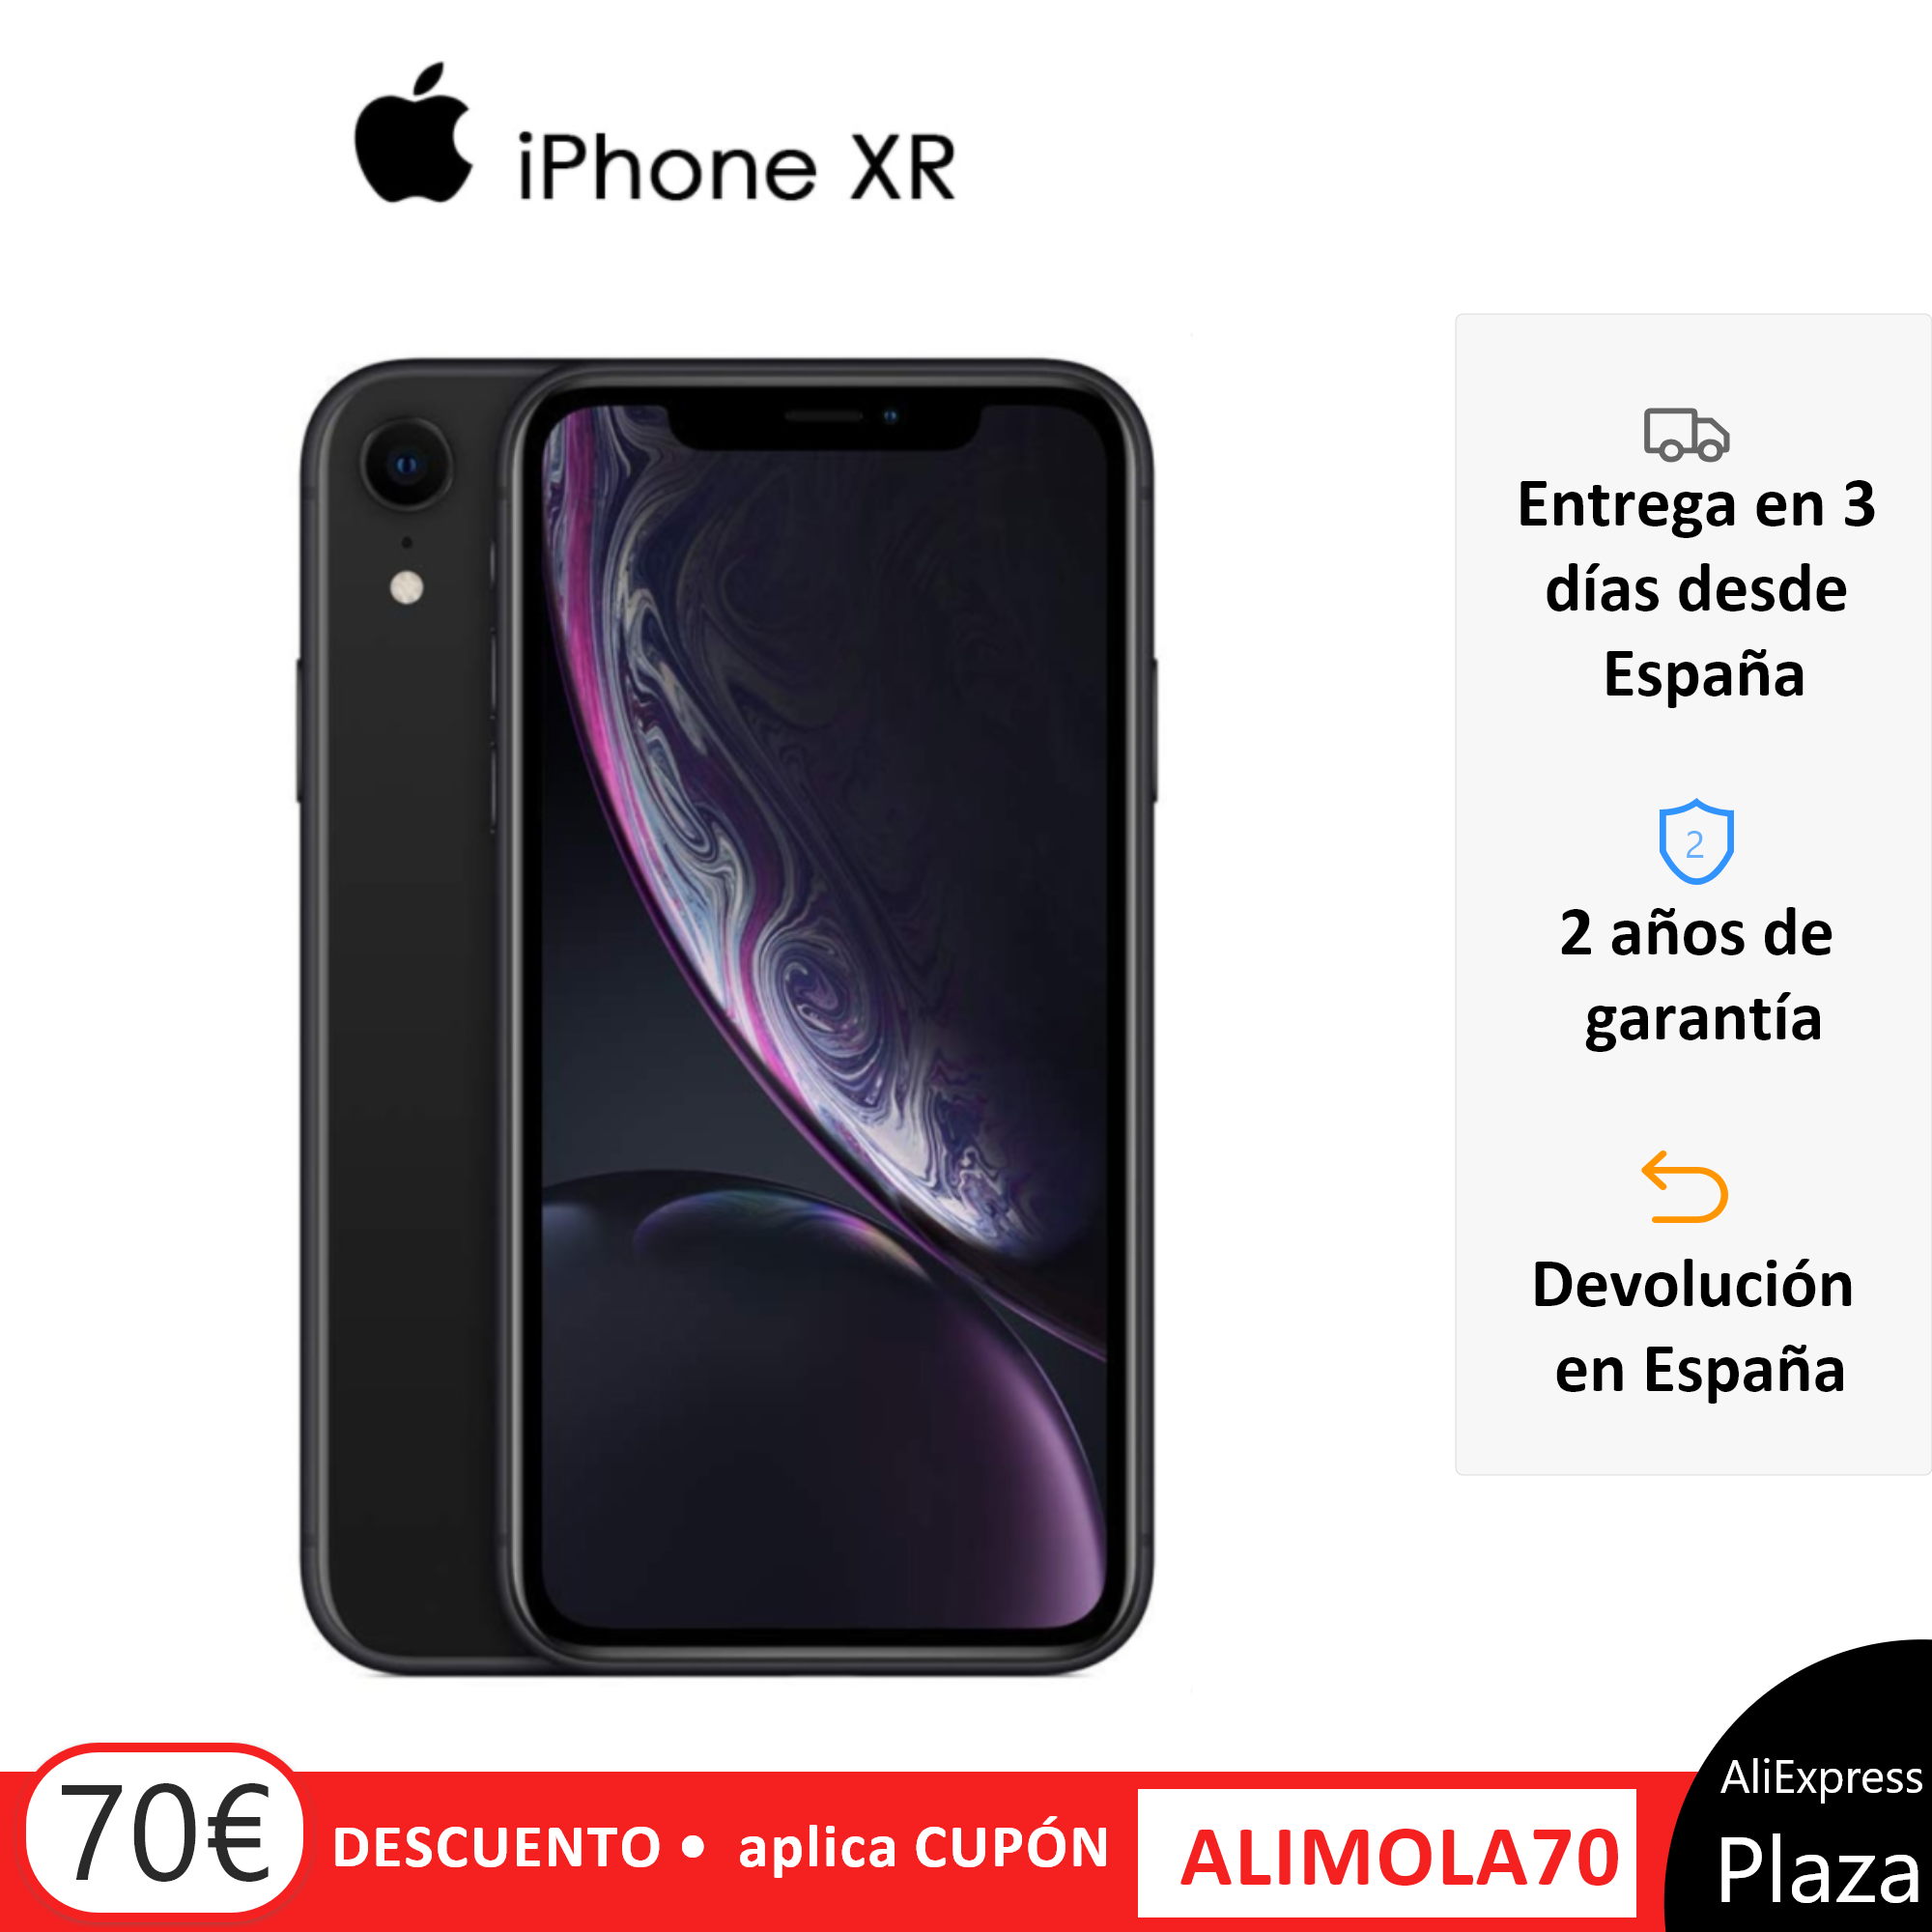 "Smartphone Apple iPhone XR, 64 go, 3 go de RAM, bande 4G/LTE/Wi-Fi, 15,5 cm (pantalon 6.1 ""), couleur noire, versión Española"